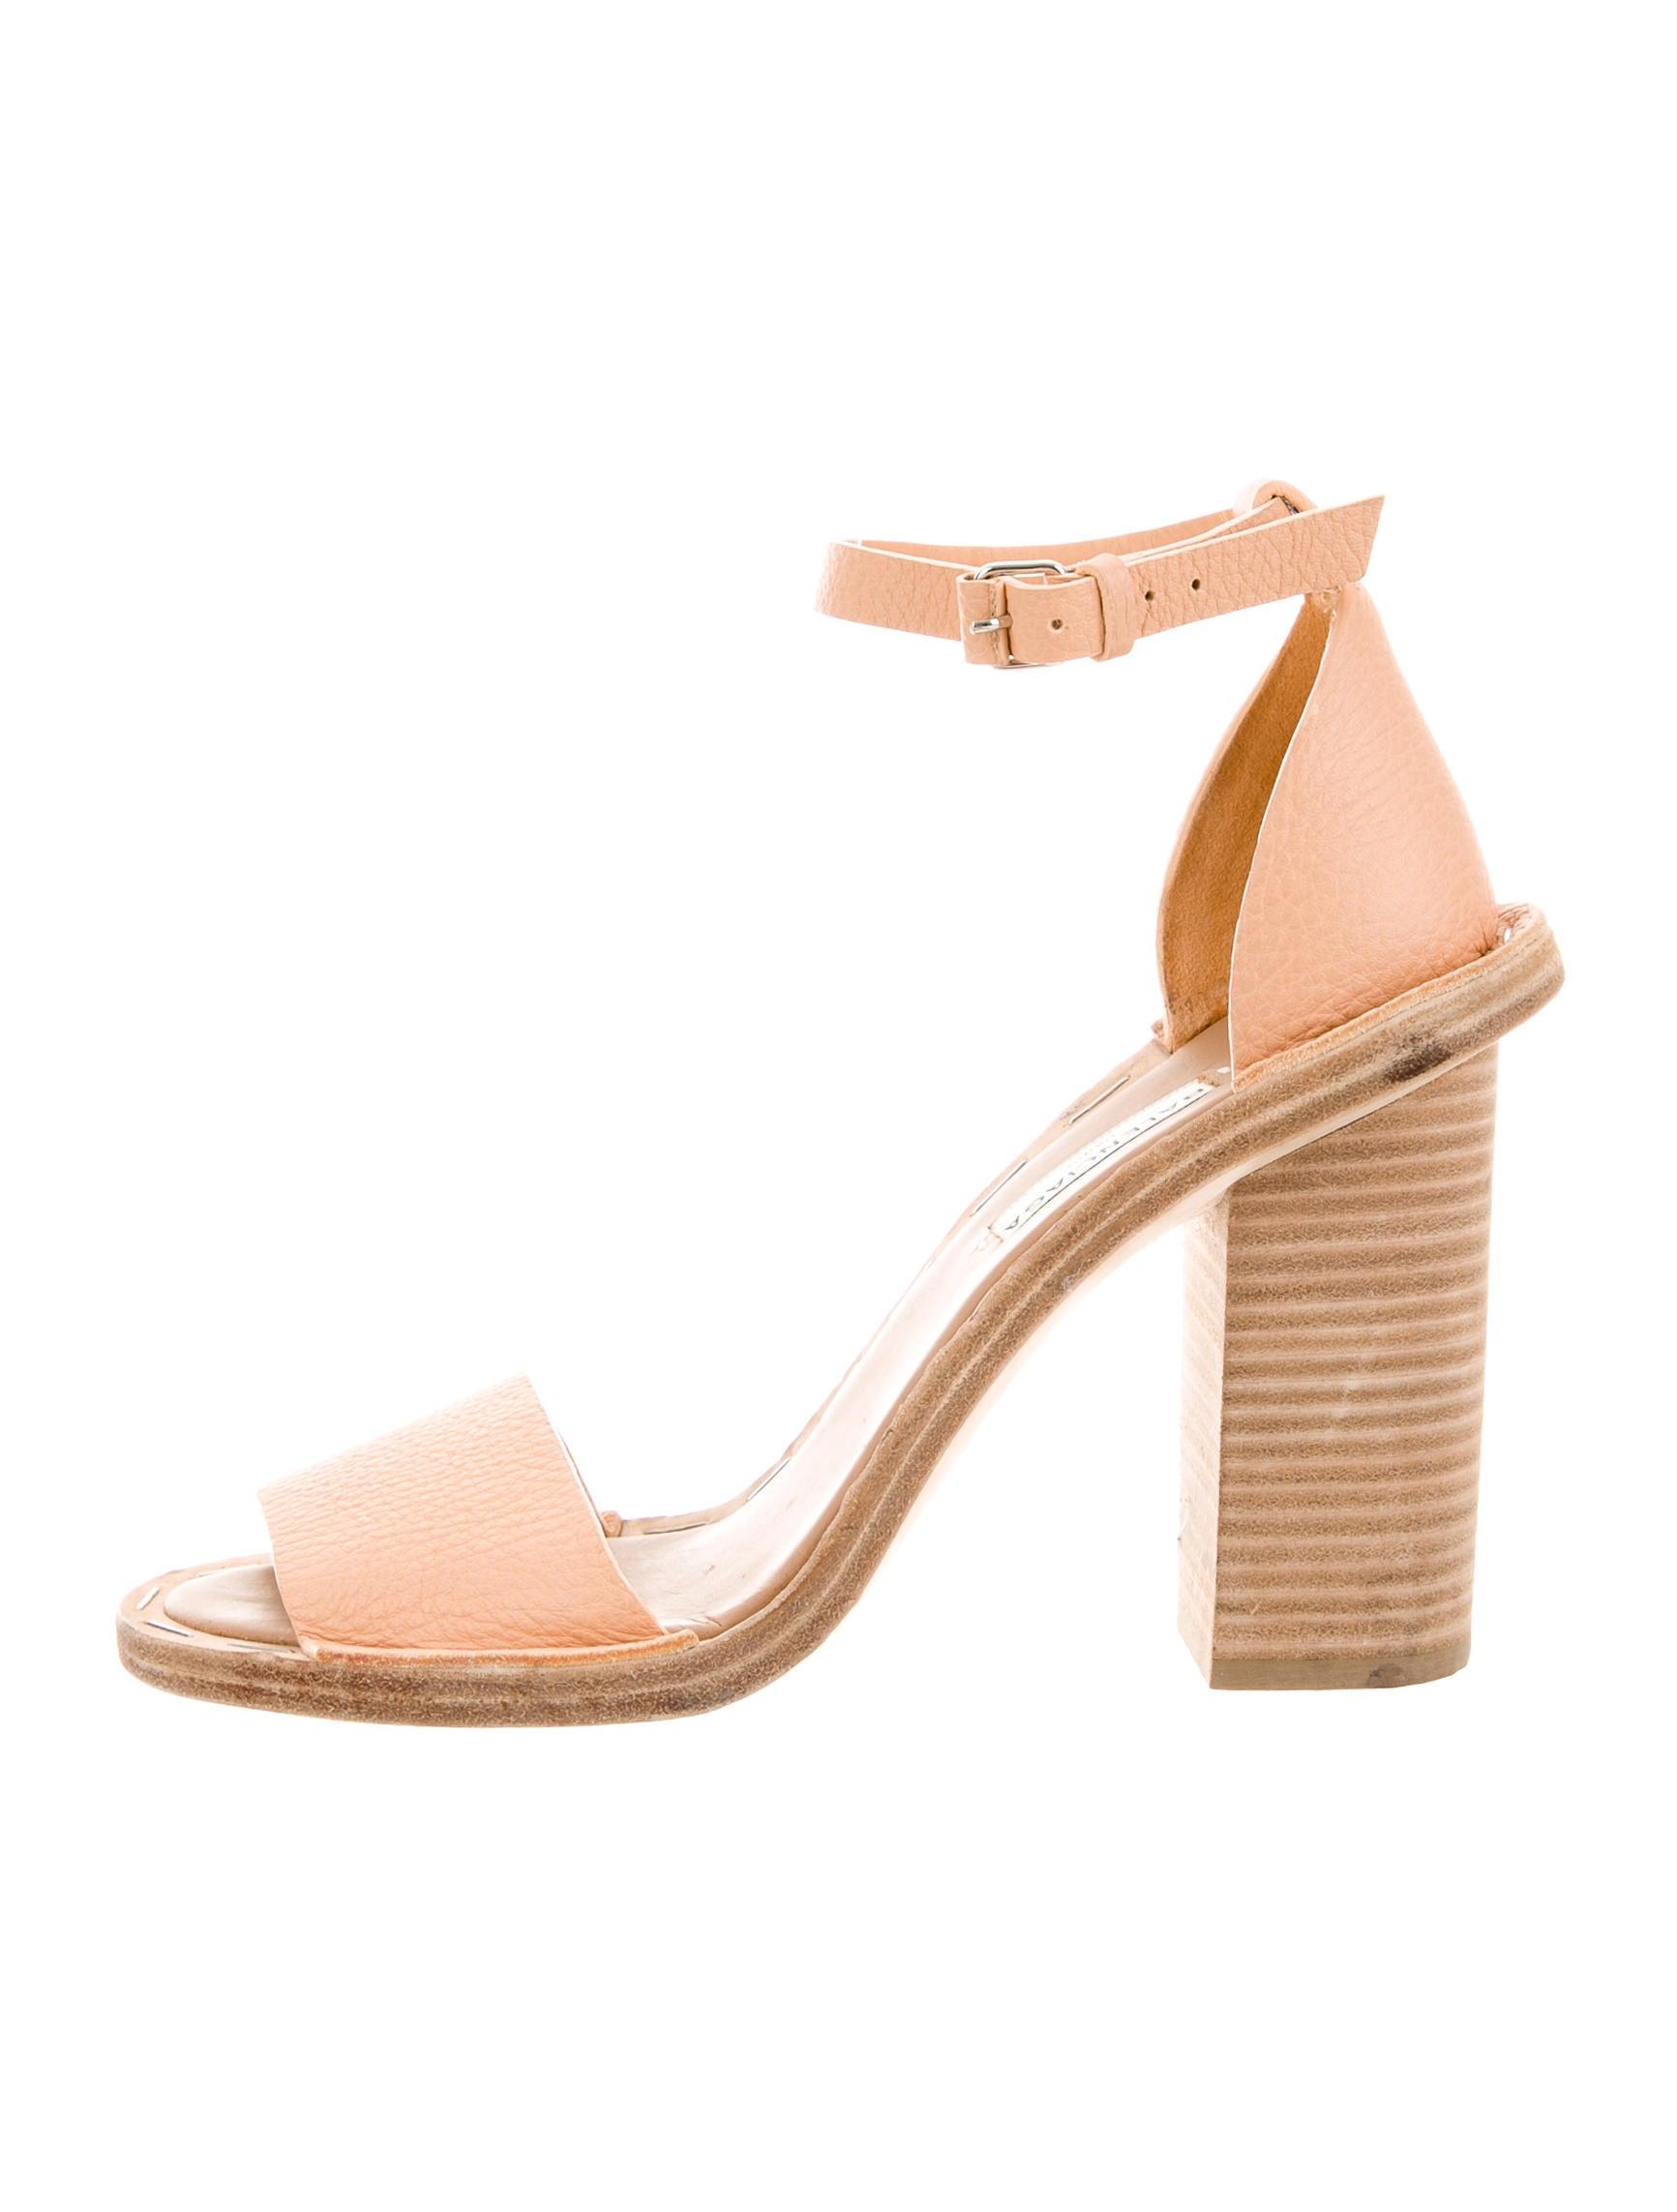 f583d74bbda Balenciaga Arena Ankle Strap Sandals - Shoes - BAL57991